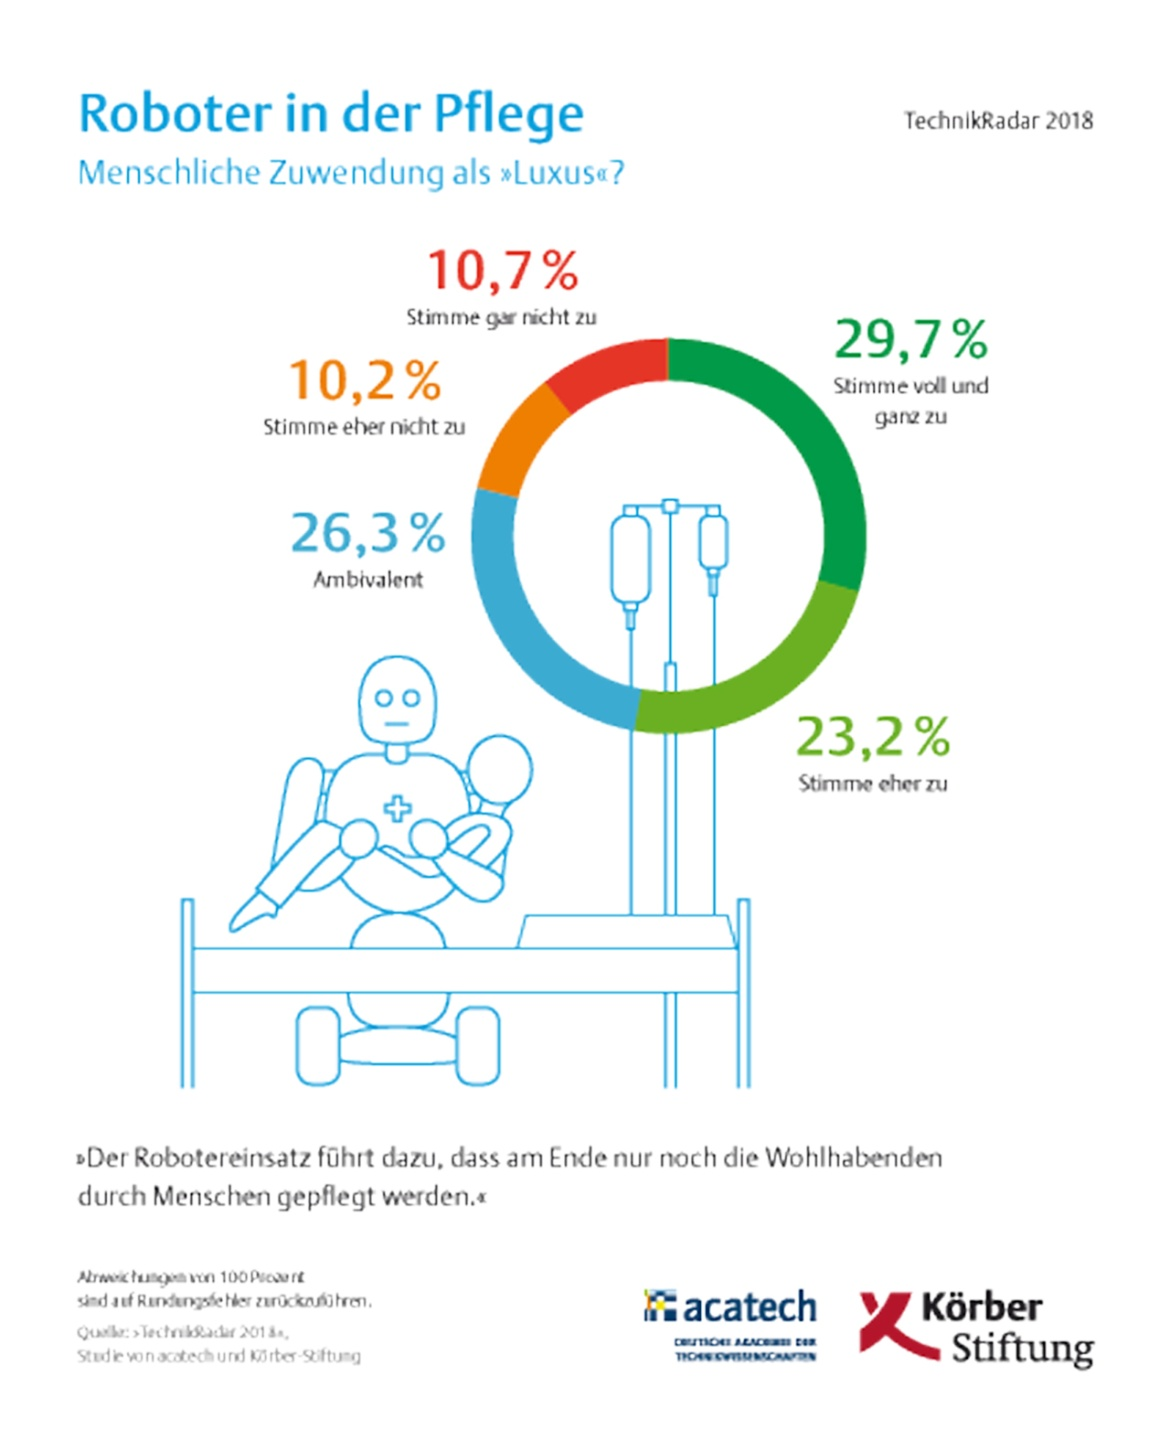 TechnikRadar: Survey results on robots in care. (c) acatech, München/Körber-Stiftung, Hamburg